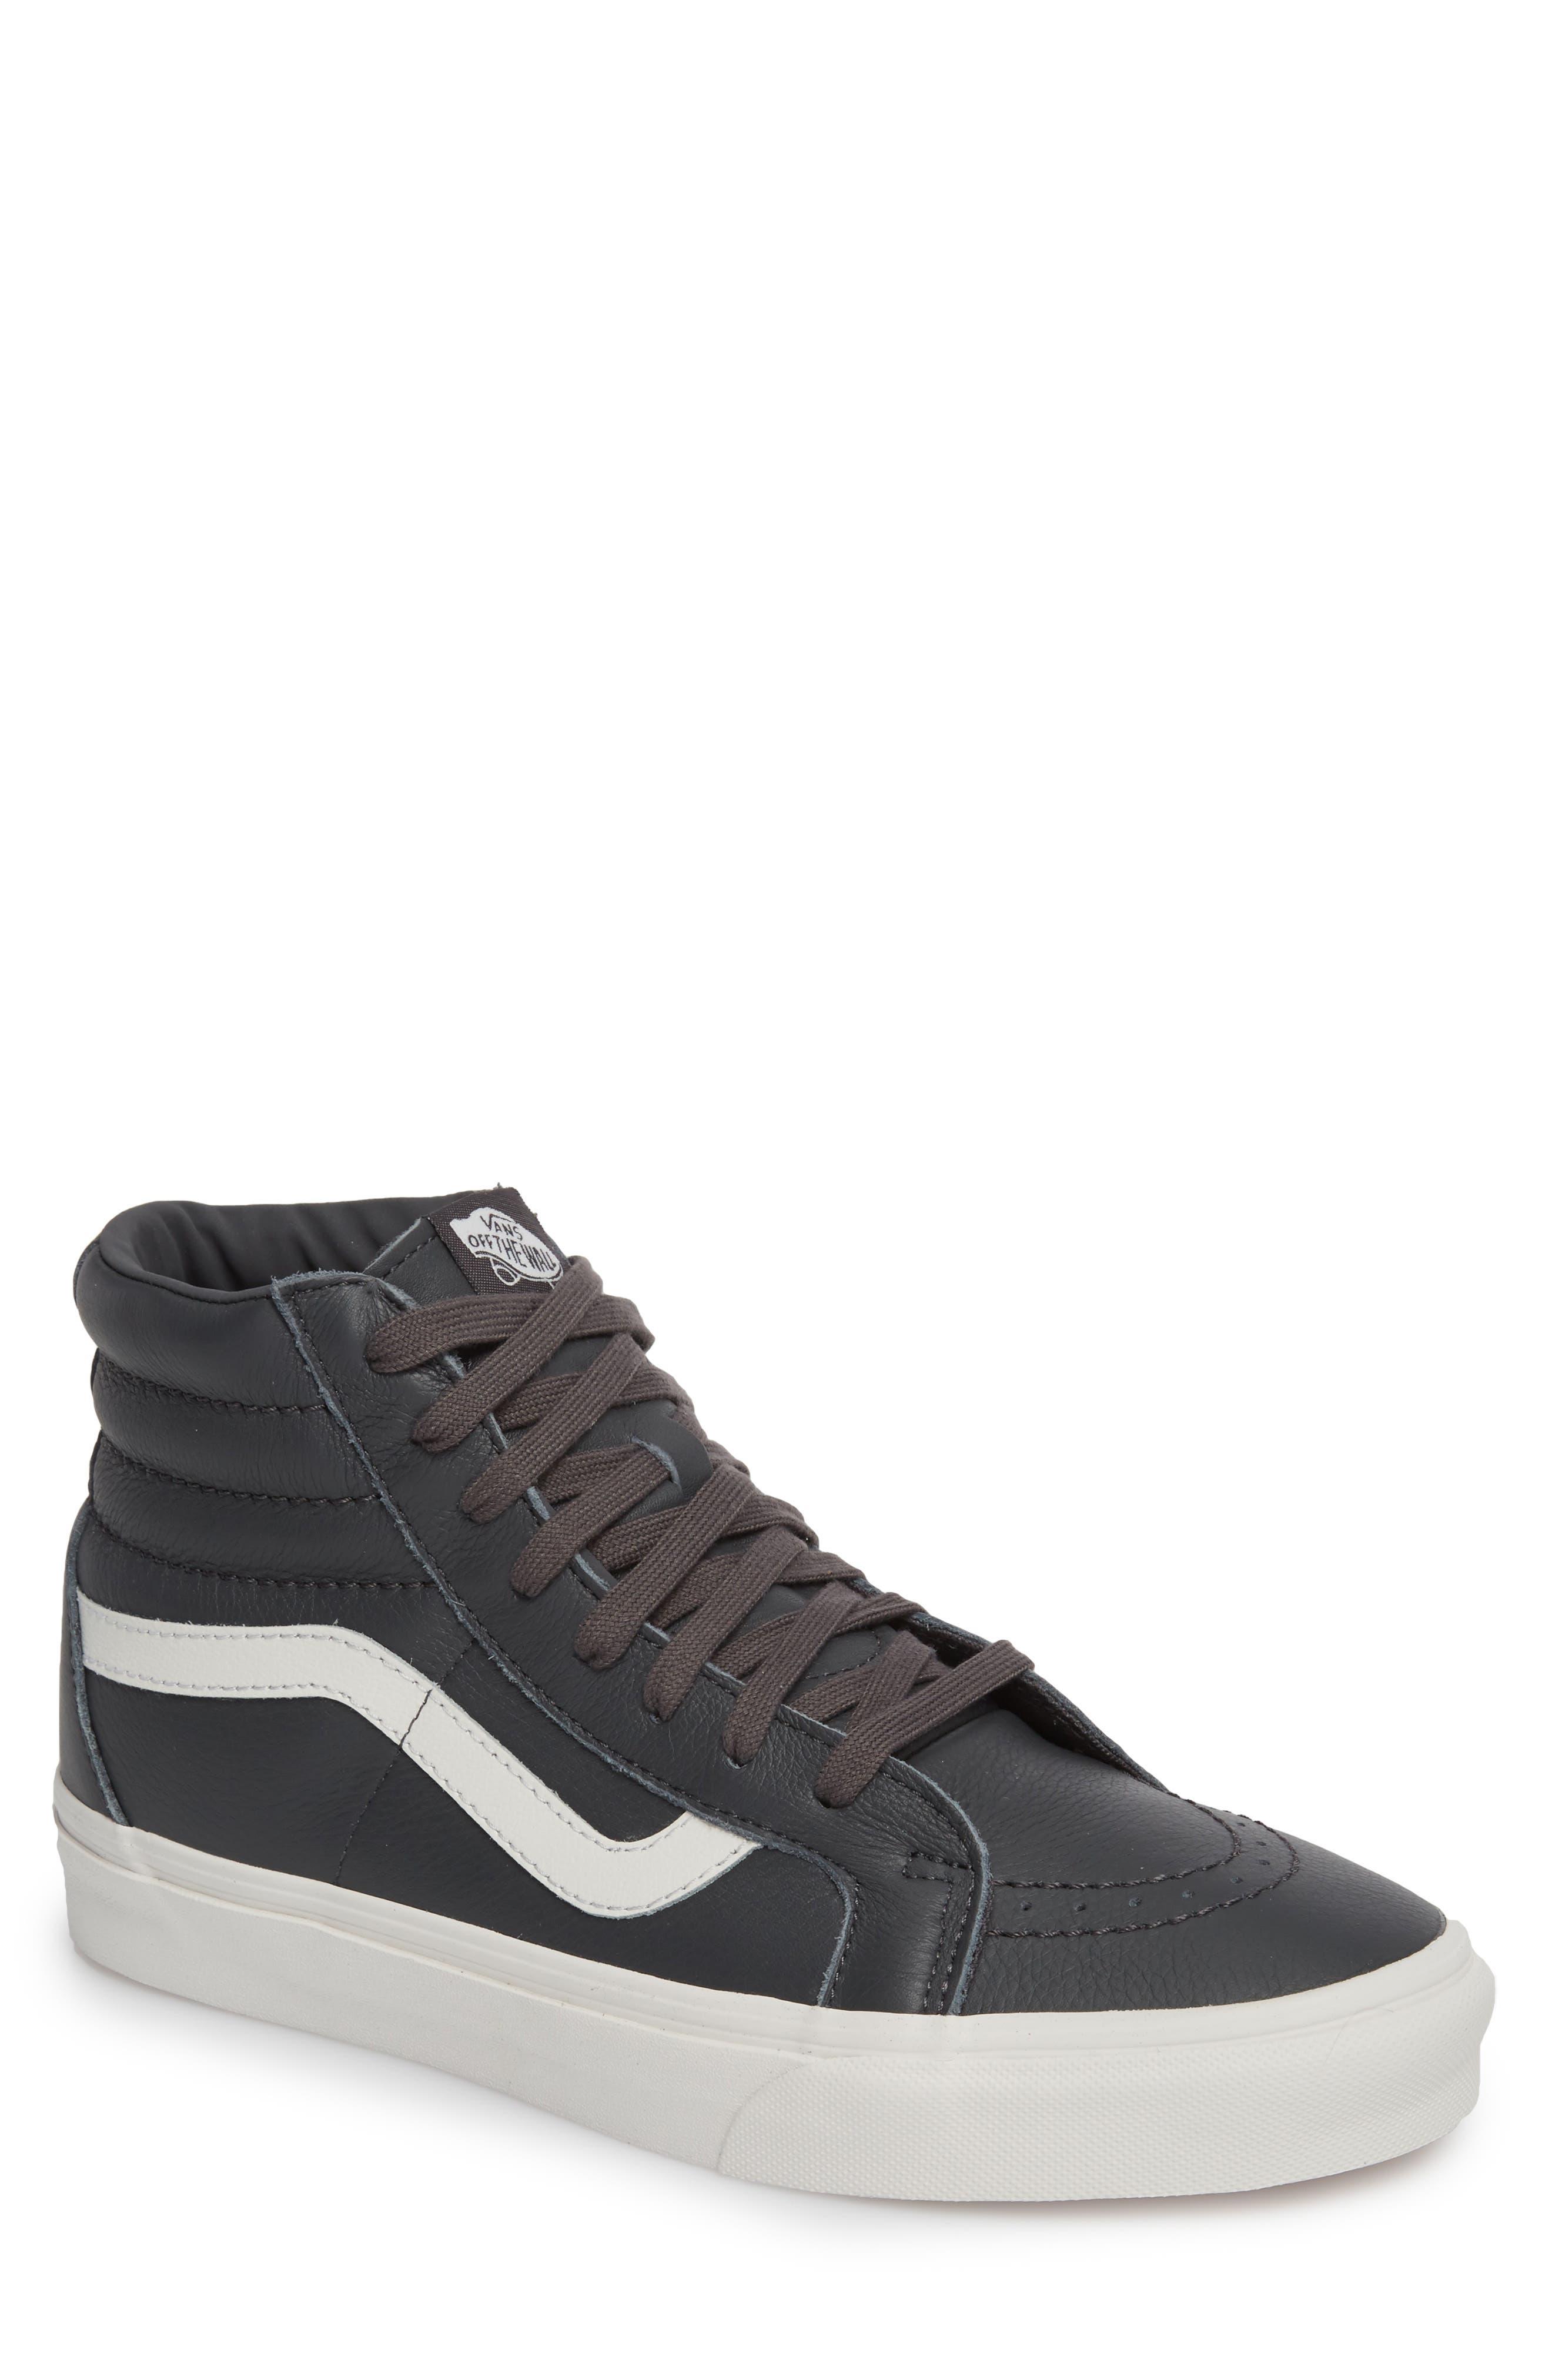 Sk8-Hi Reissue Leather Sneaker,                         Main,                         color, 020